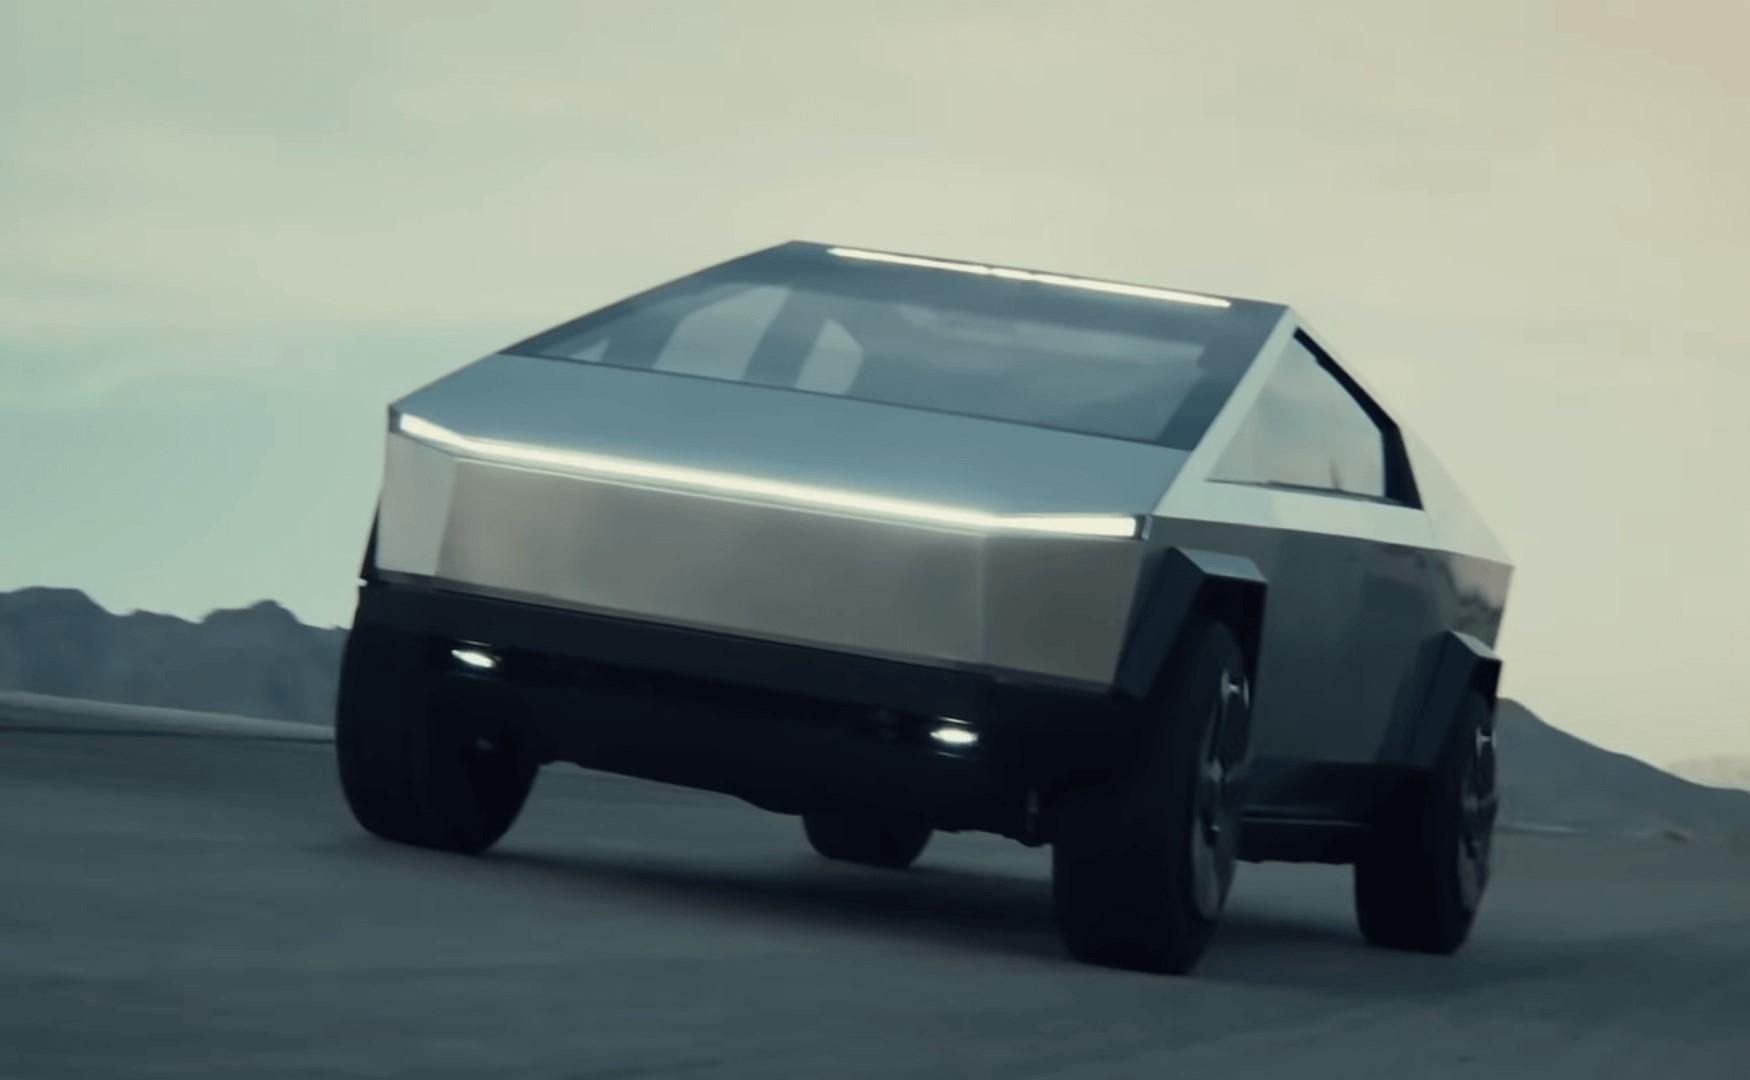 New-Tesla-Cybertruck-The-Reinvented-Pickup-Truck